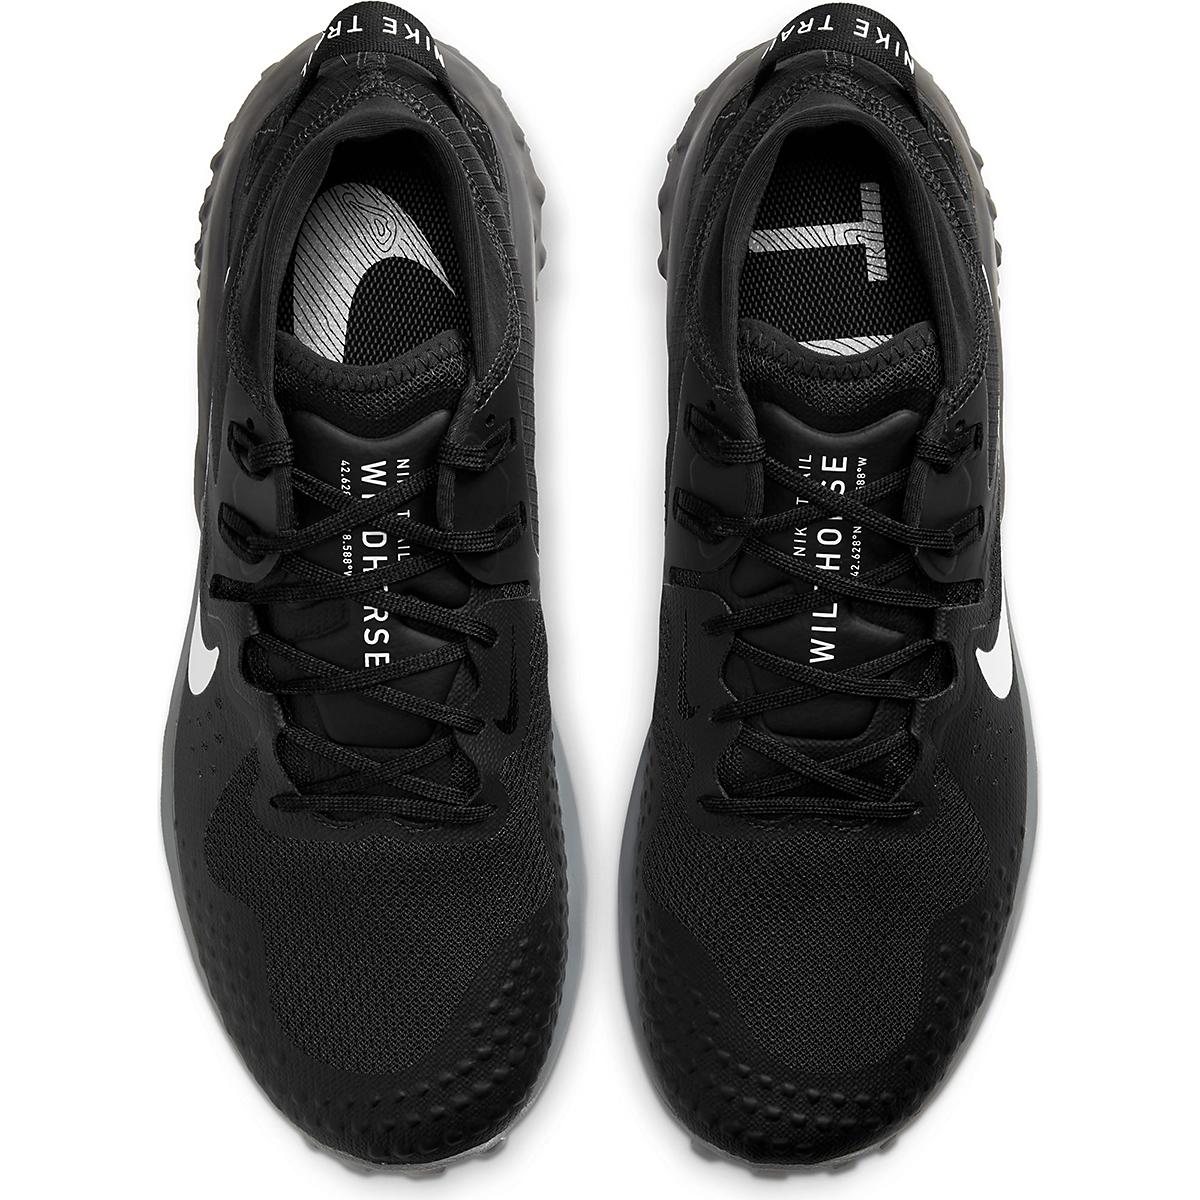 Men's Nike Wildhorse 6 Trail Running Shoe - Color: Off Noir/Spruce Aura-Black-Iron Grey - Size: 6 - Width: Regular, Off Noir/Spruce Aura-Black-Iron Grey, large, image 4